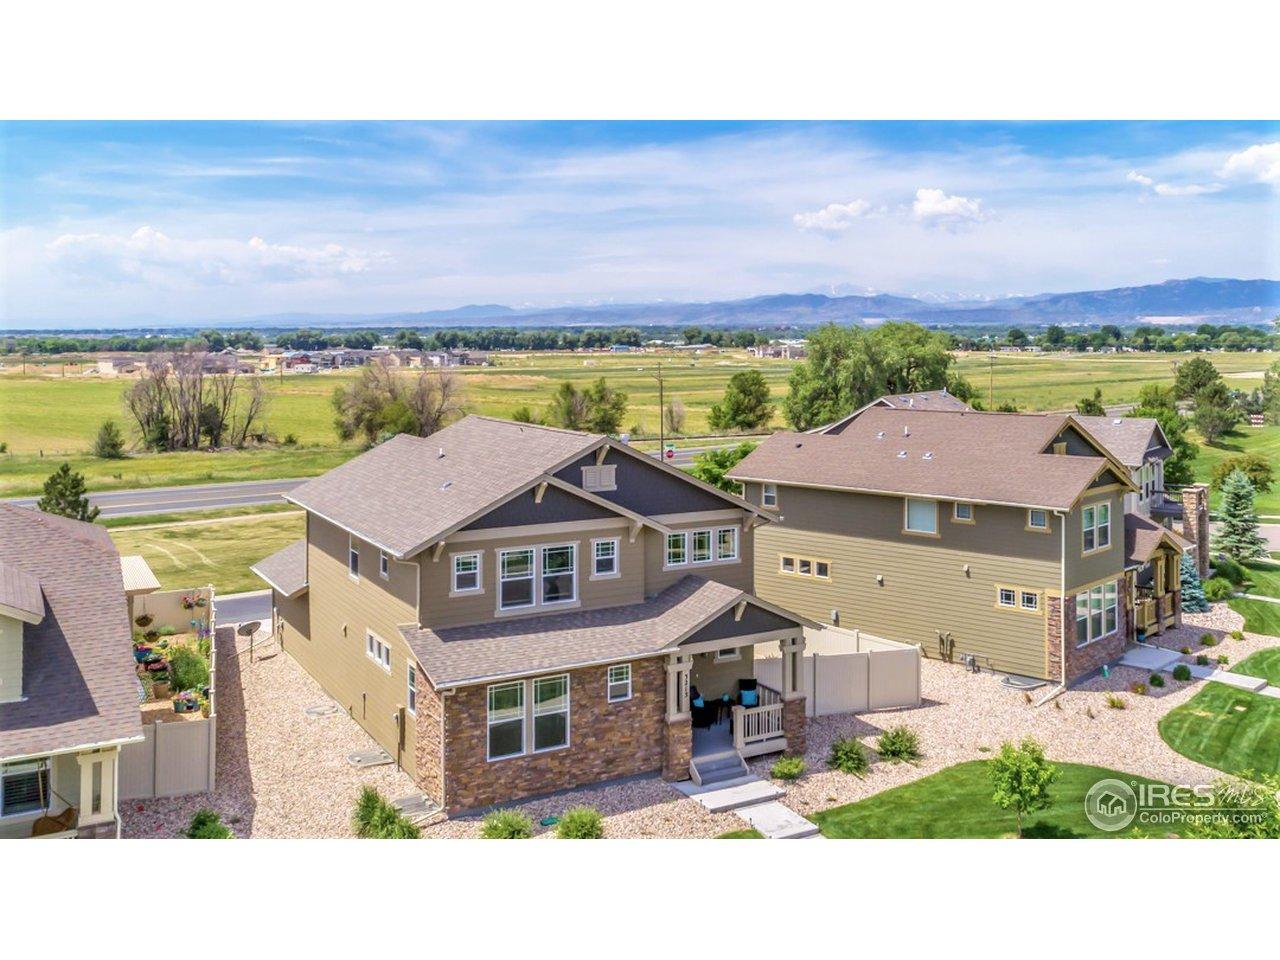 3215 Greenlake Dr, Fort Collins CO 80524